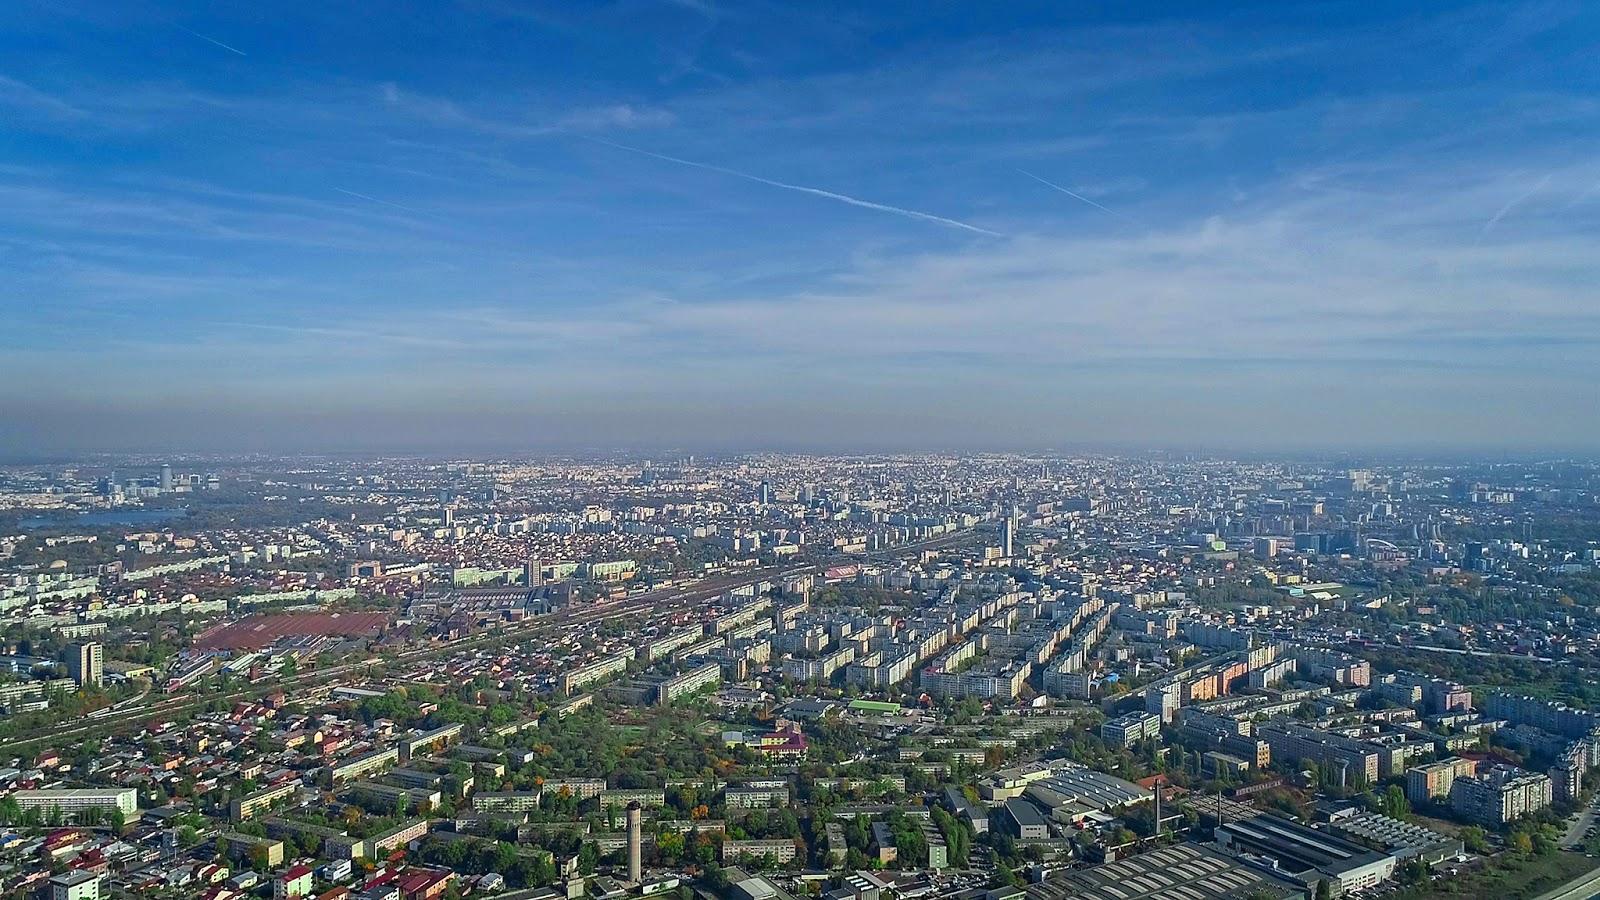 Fotografii drona in Bucuresti